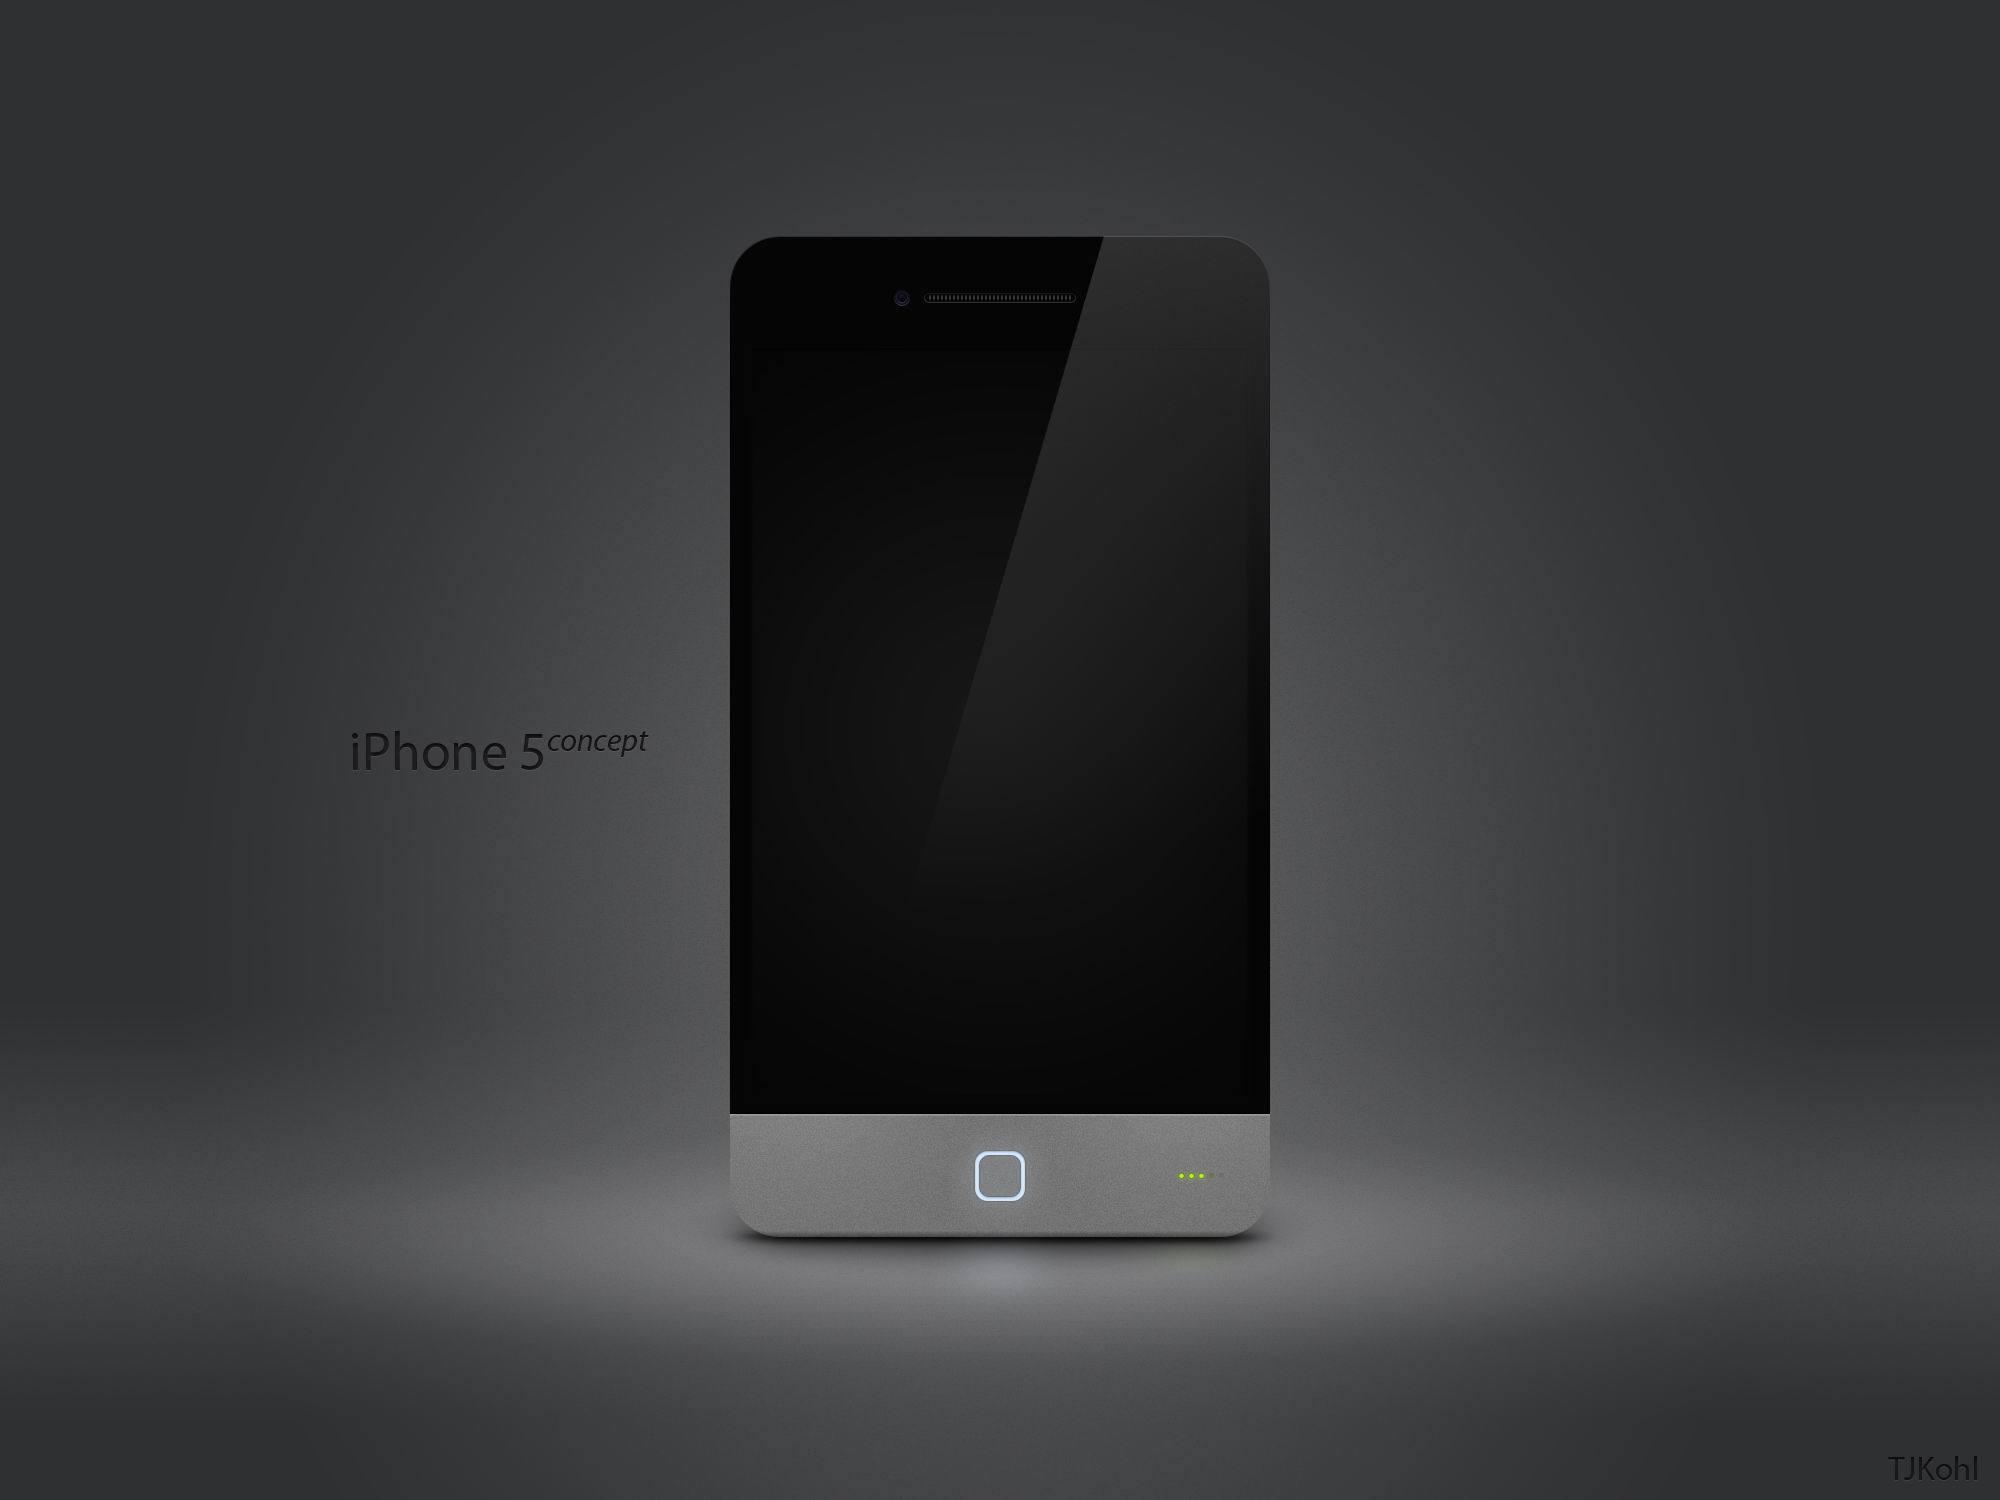 картинки айфон 5 на рабочий стол